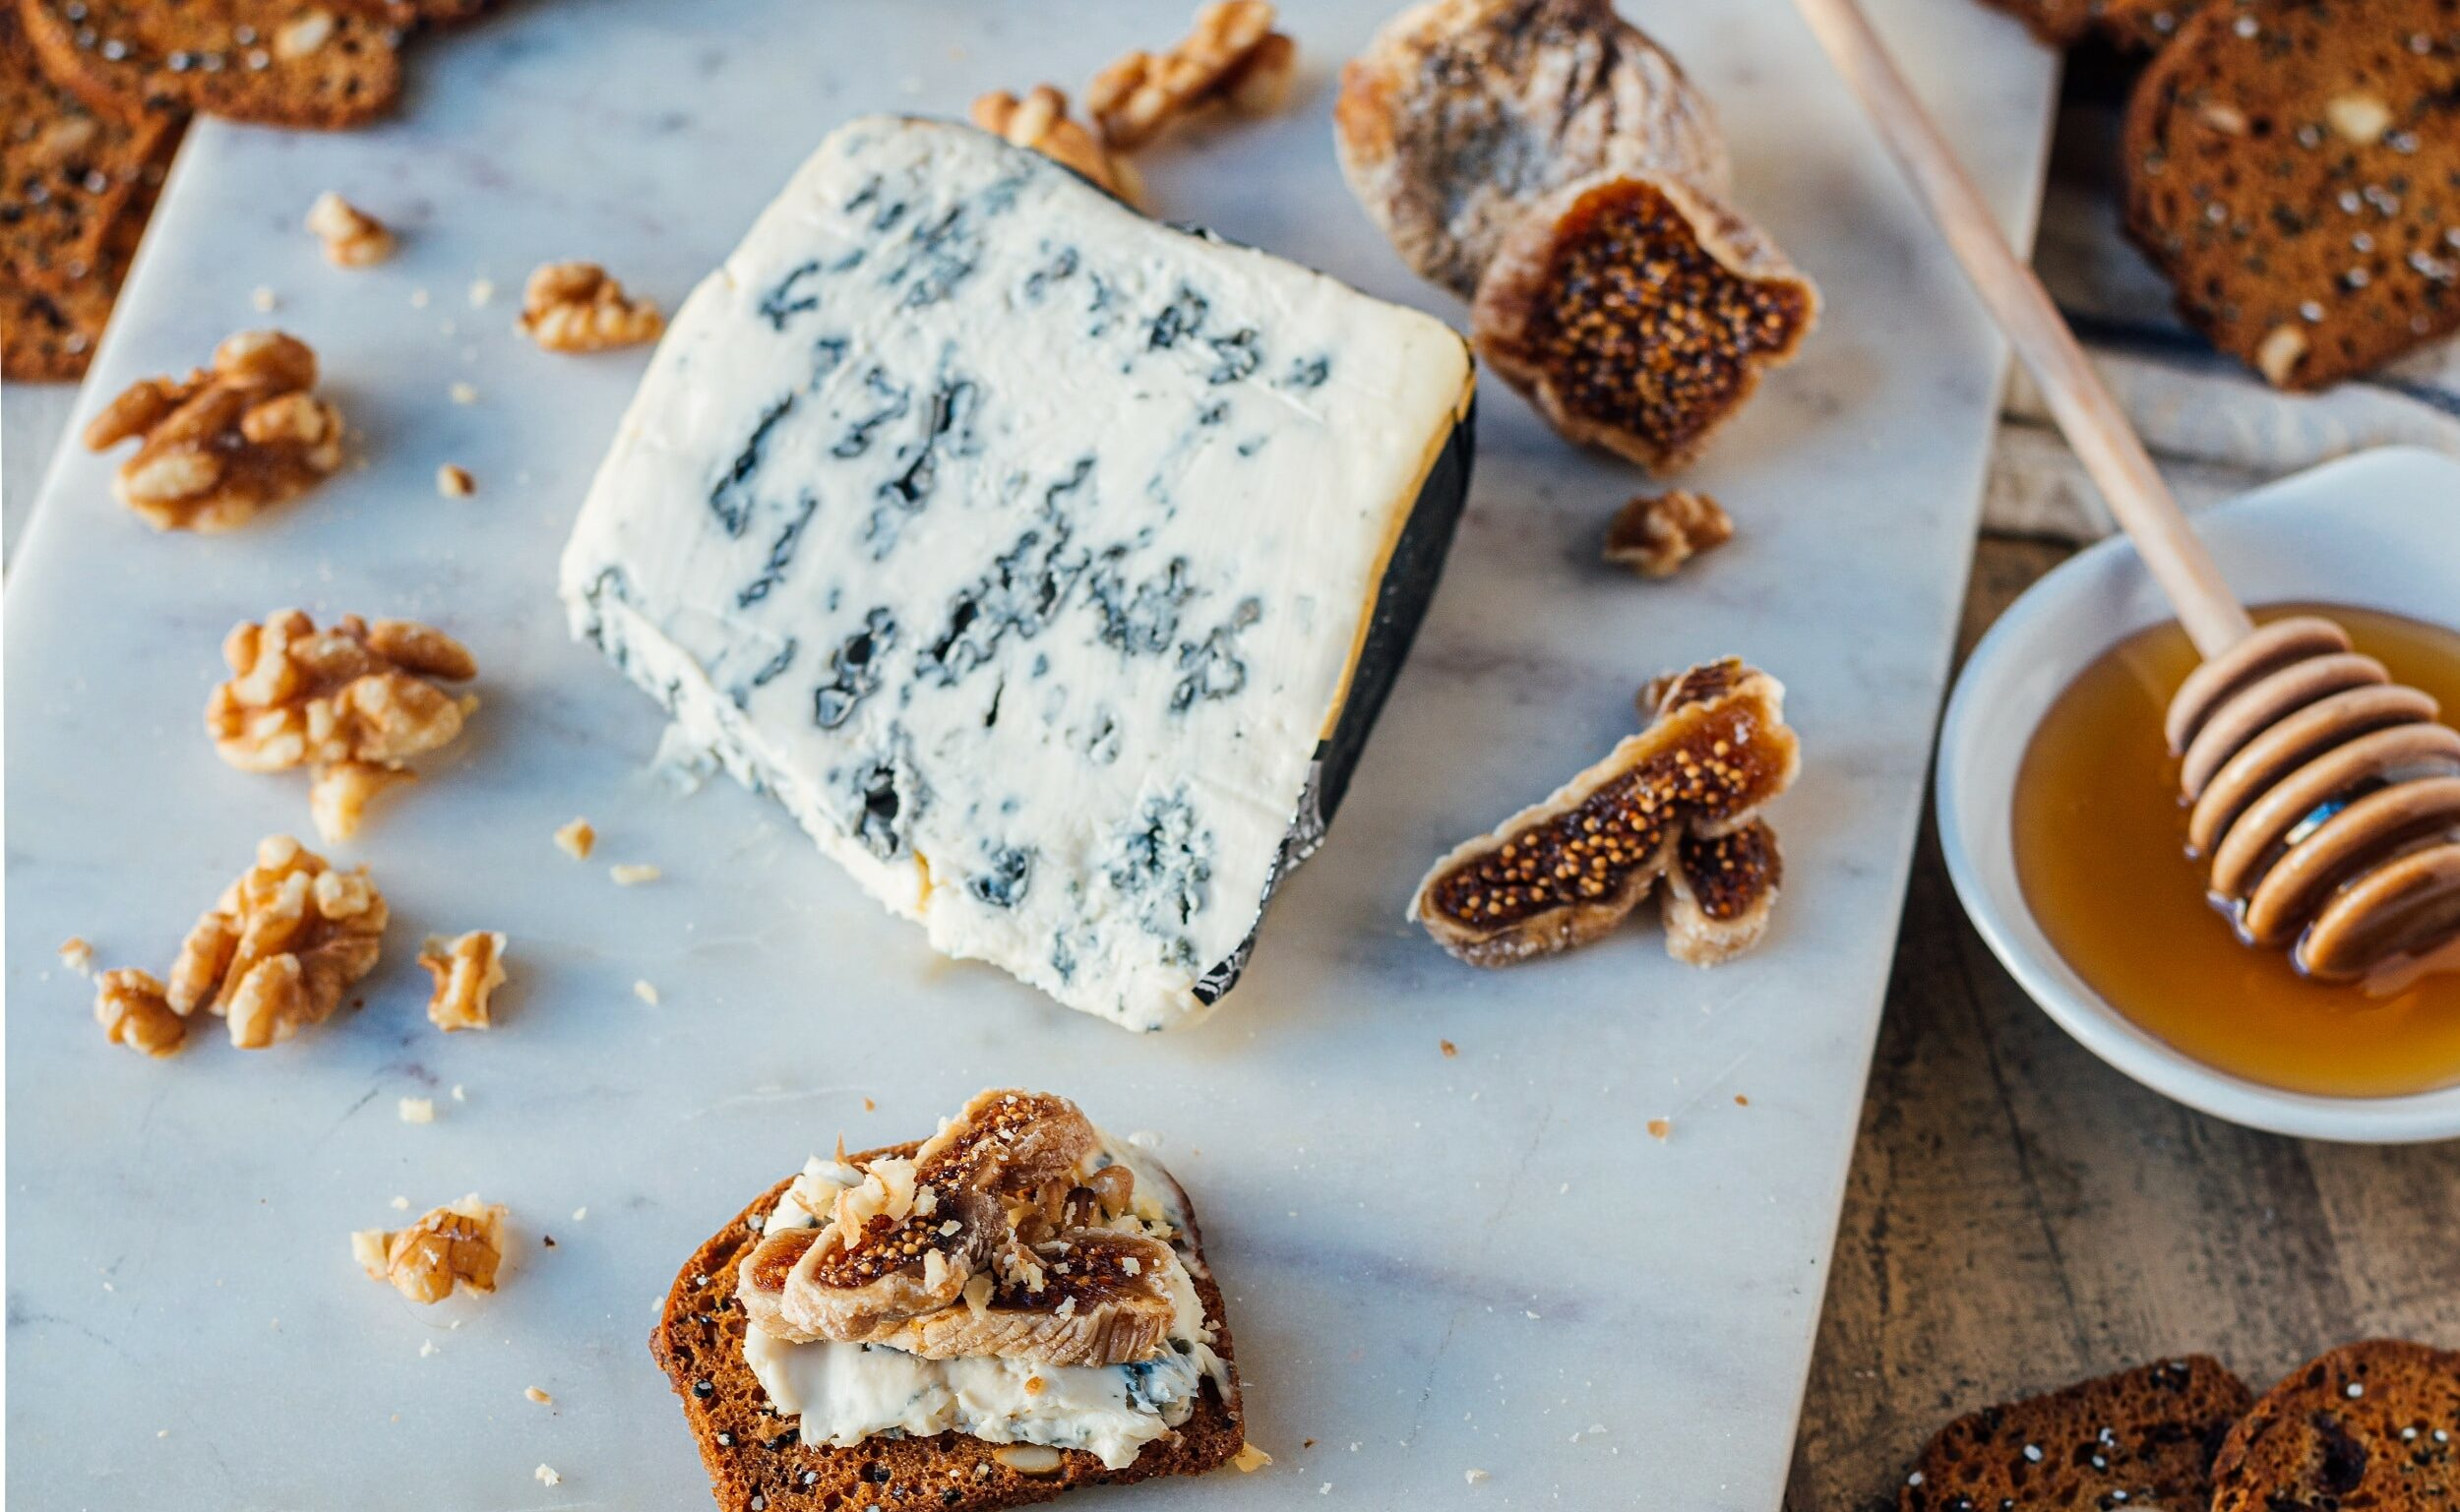 saint agur and fig on a cereal bread